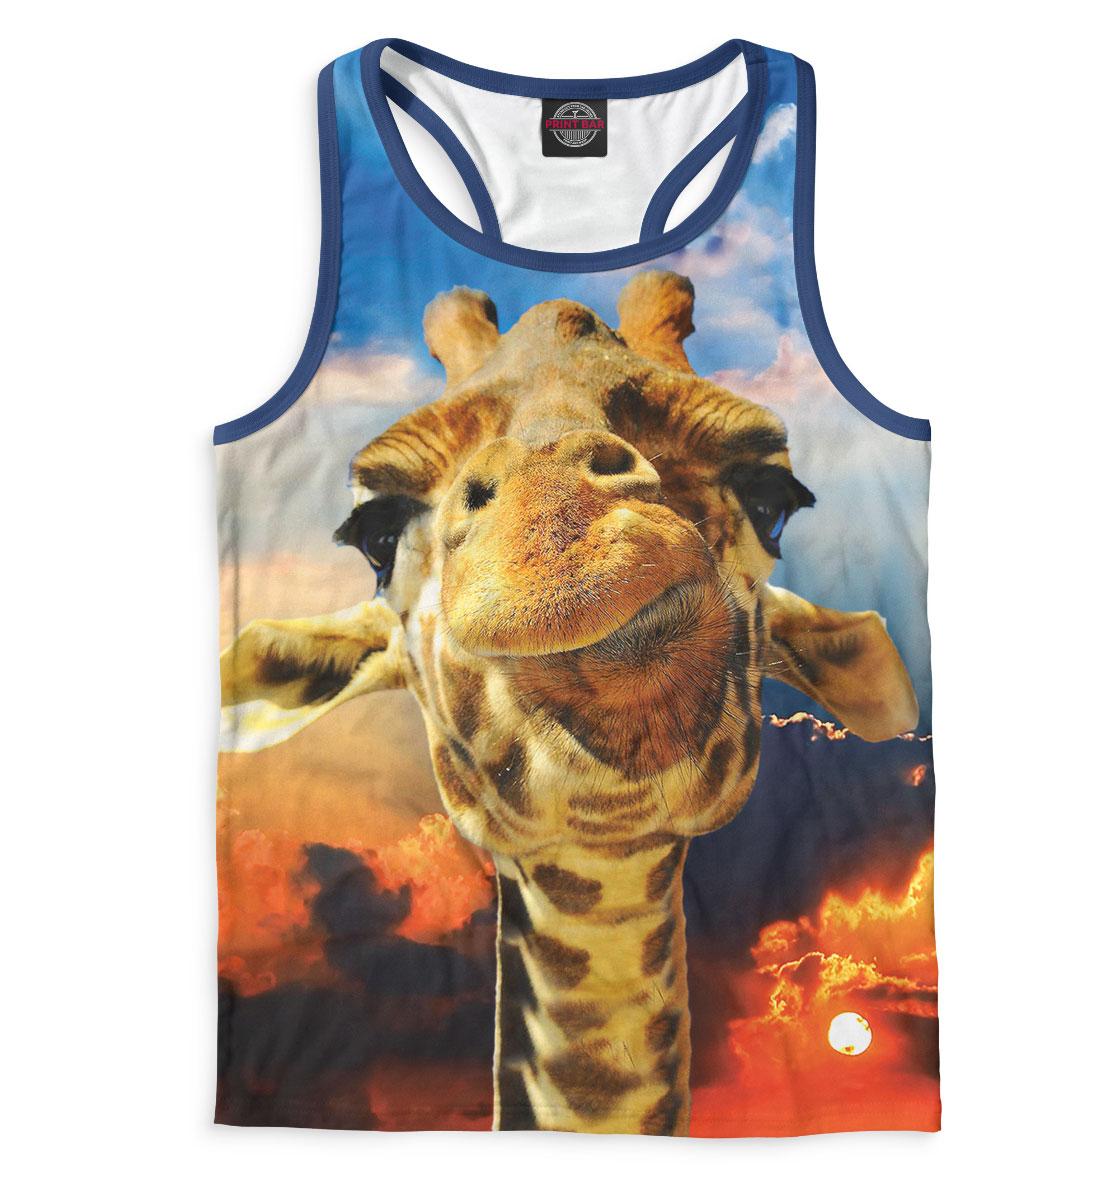 Купить Жираф, Printbar, Майки борцовки, GIR-382583-mayb-2